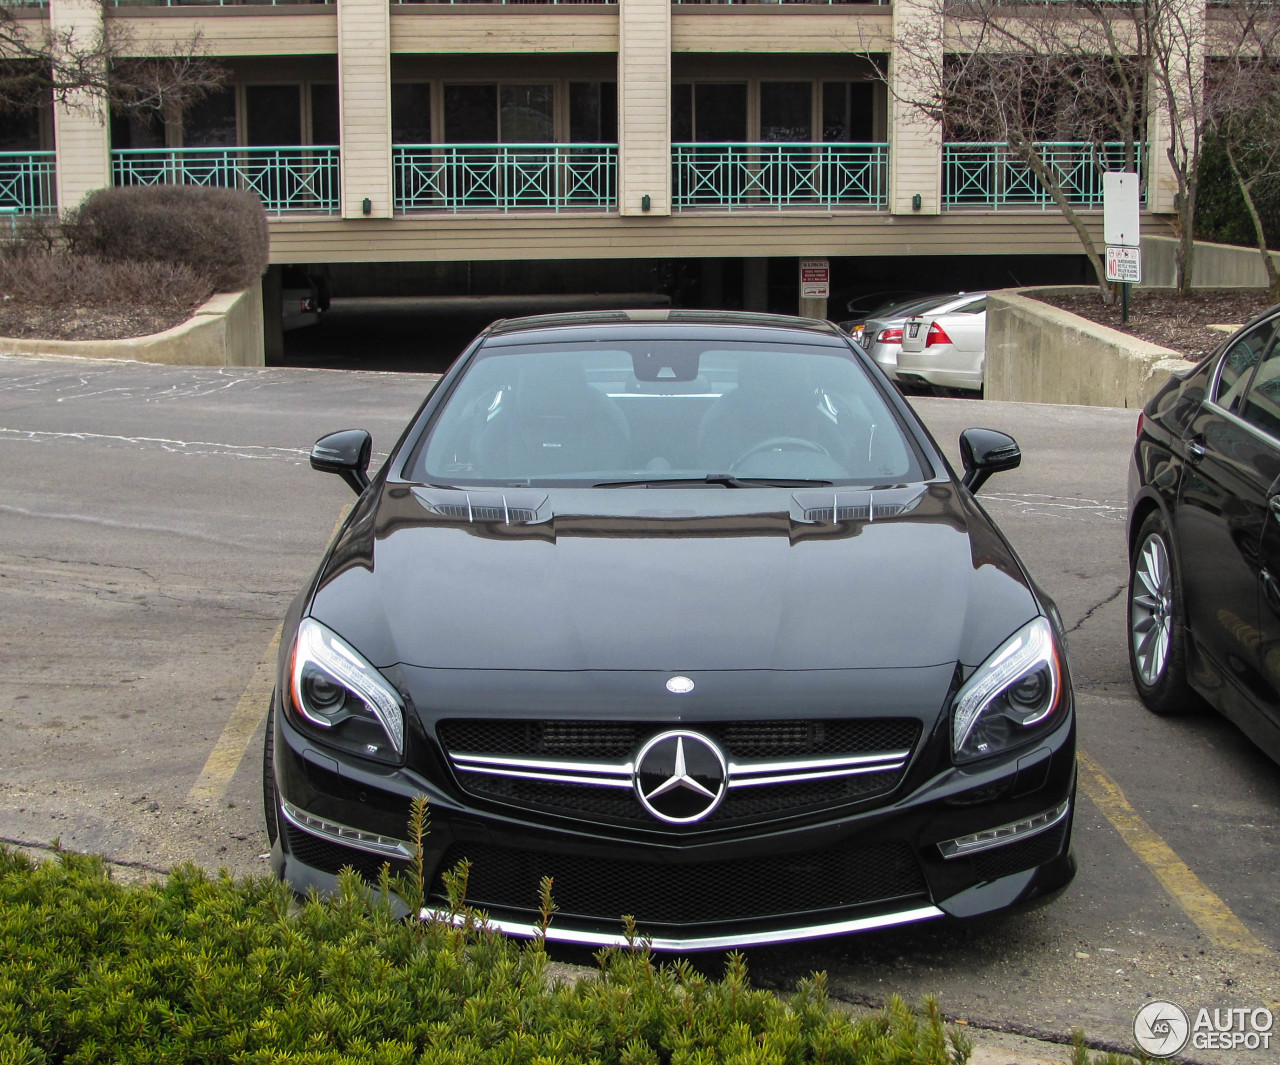 Mercedes Benz Sl 63 Amg R231 26 Mai 2015 Autogespot